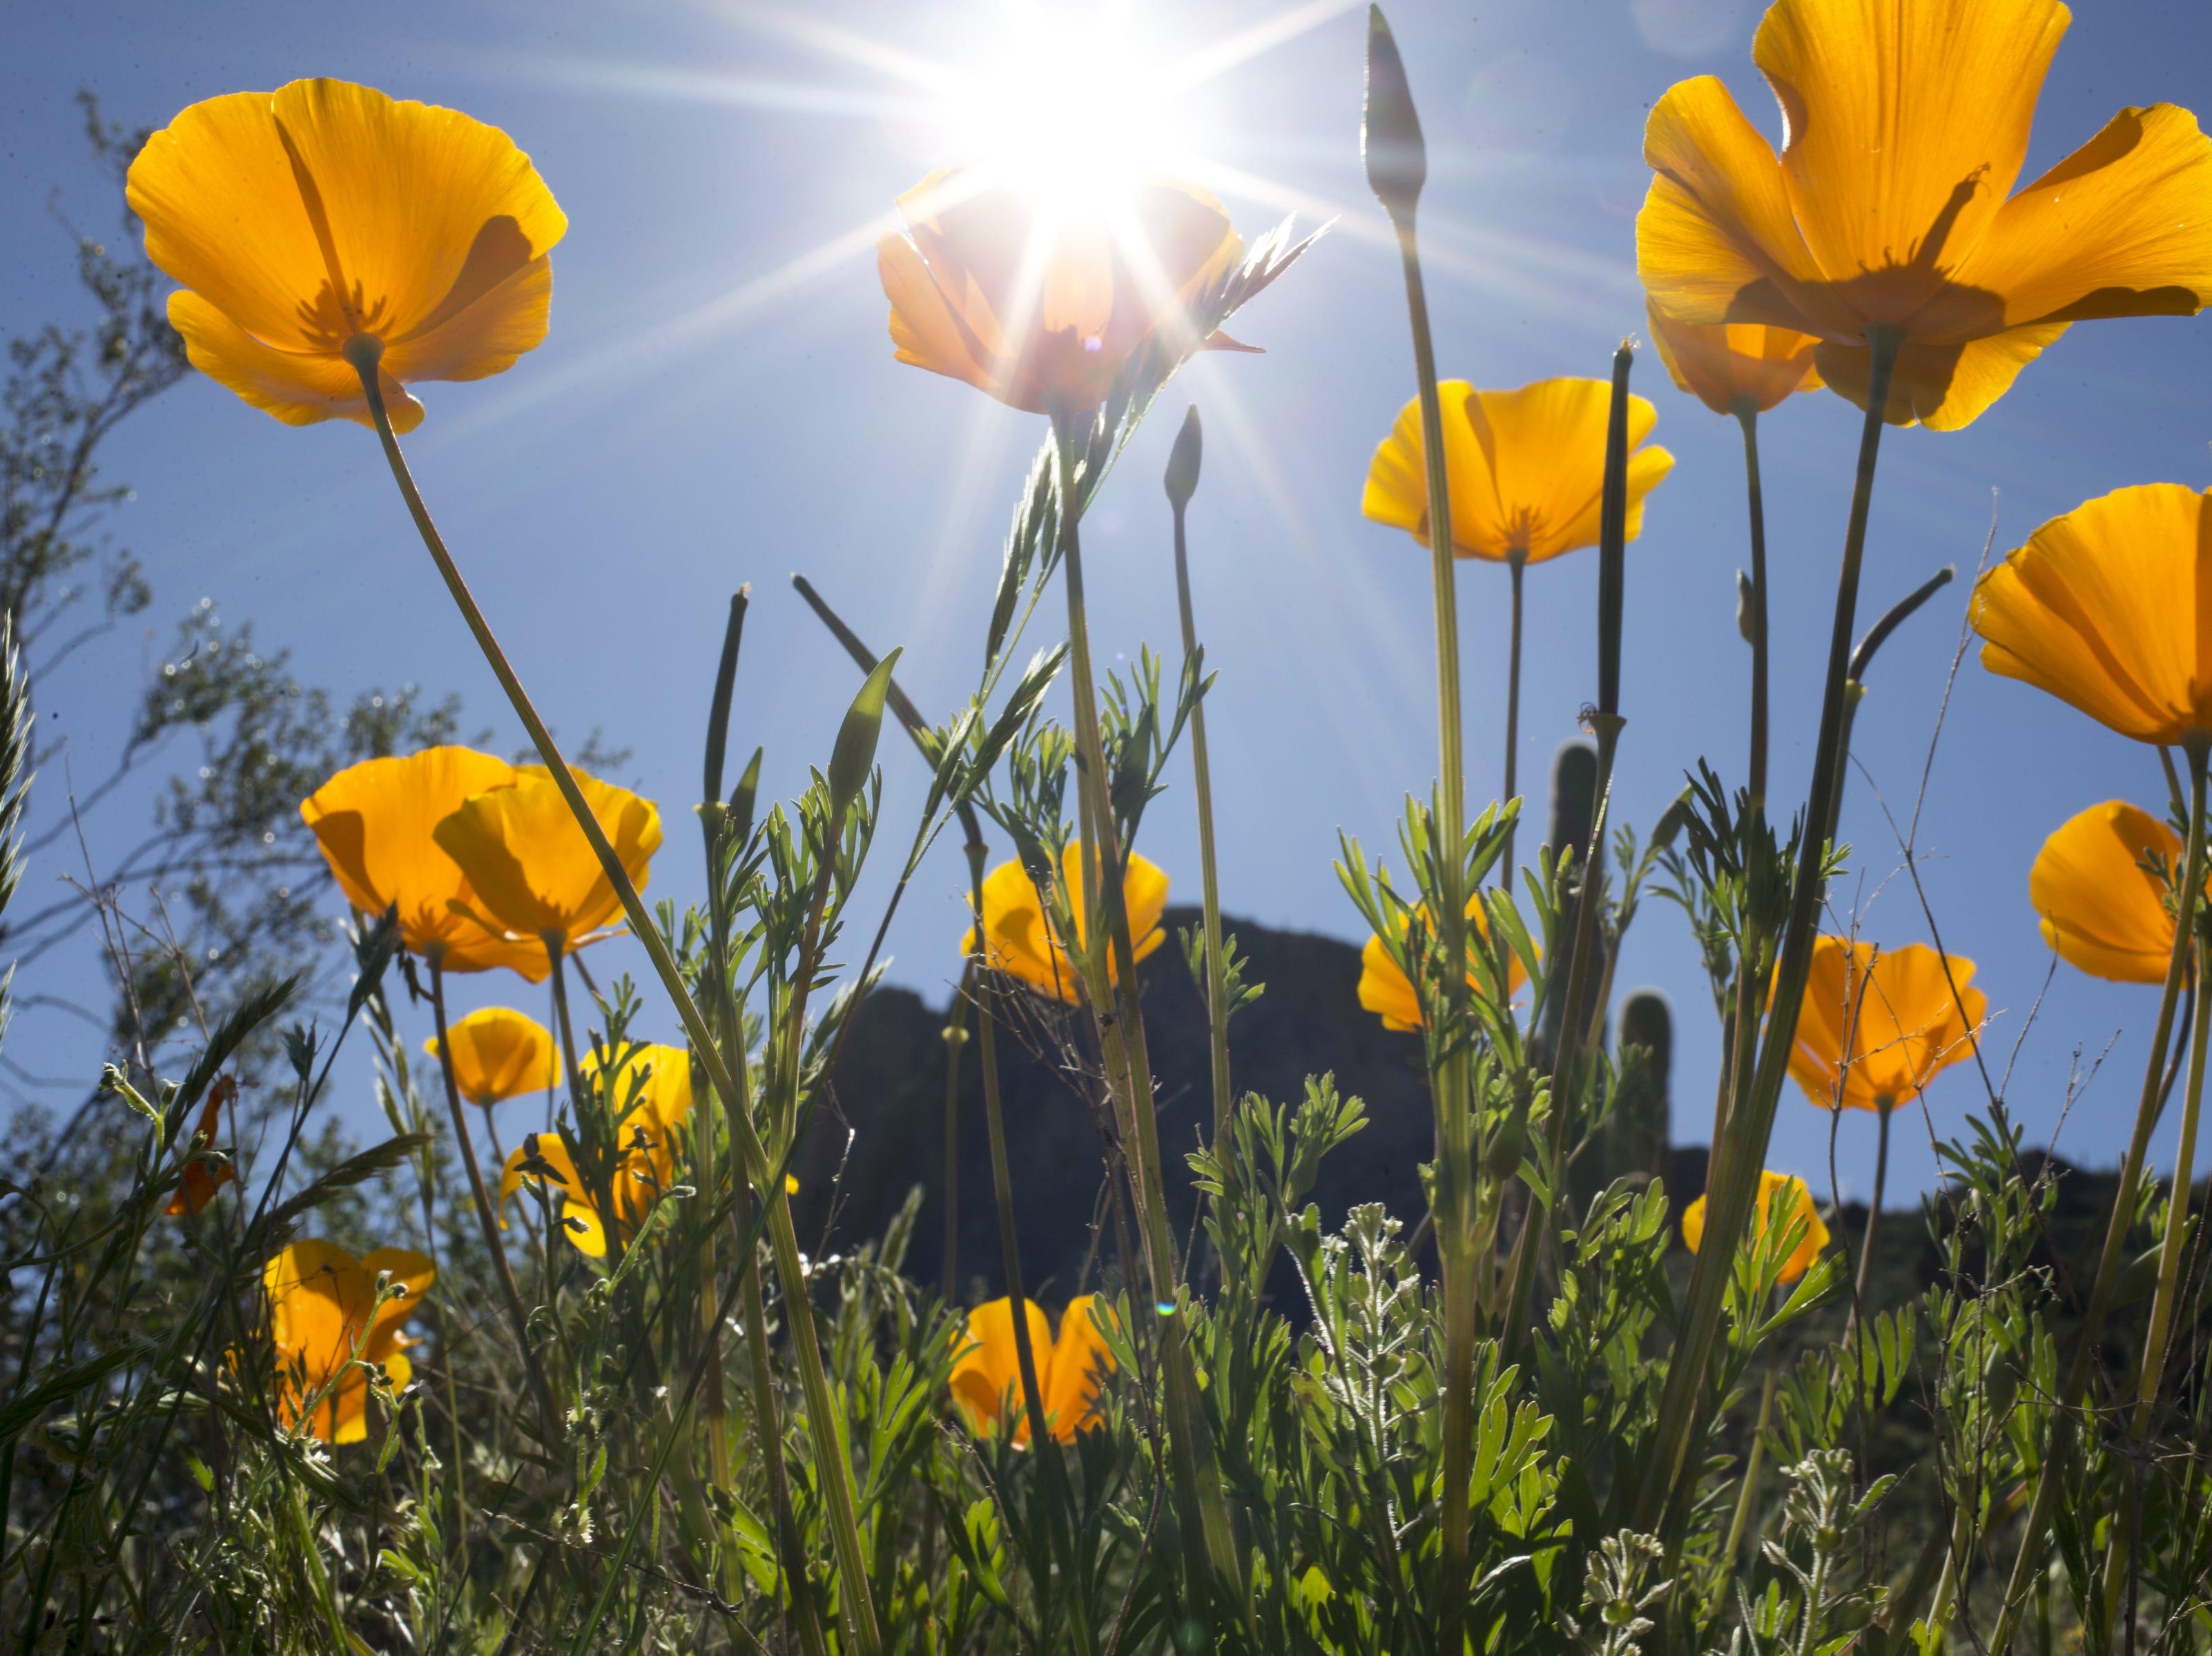 Poppies, March 5, 2019, at Picacho Peak State Park, Arizona.